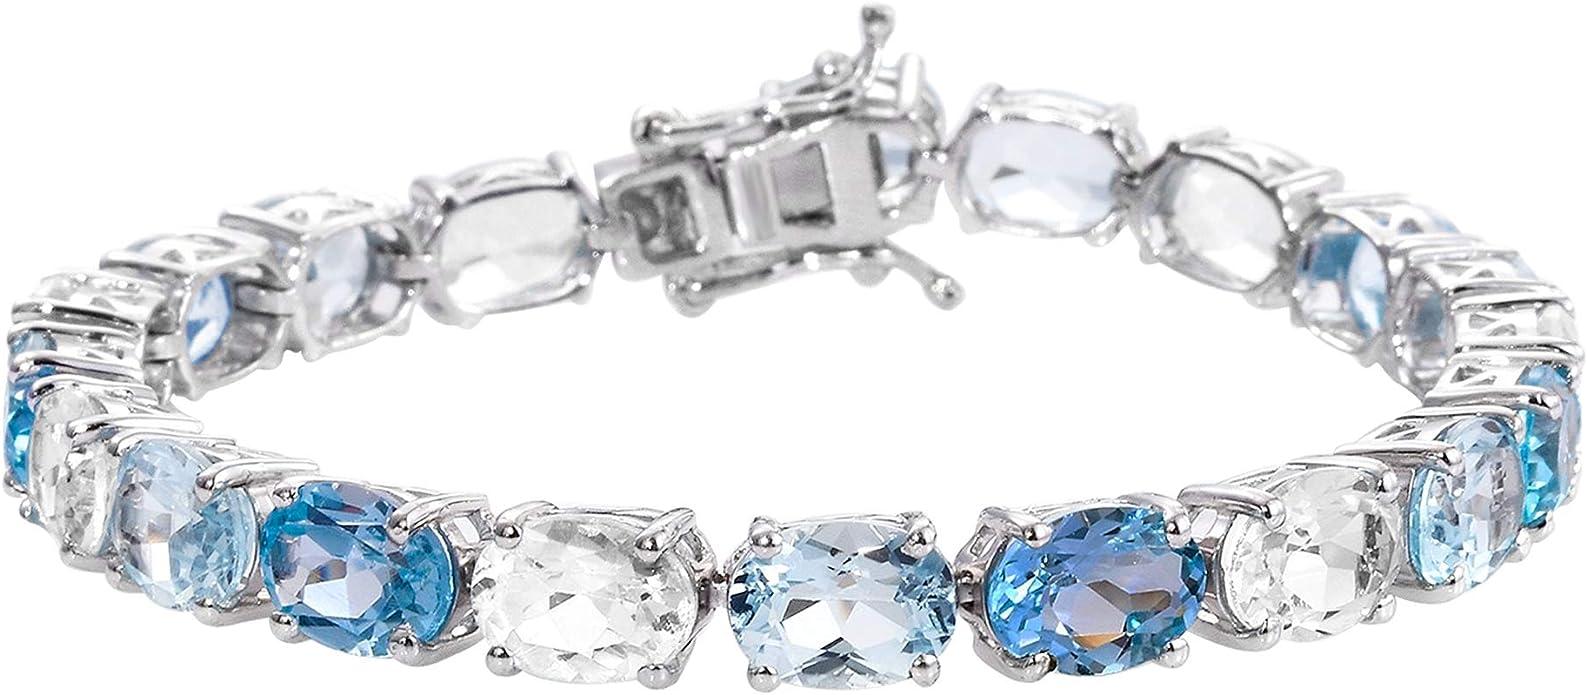 Details about  / Natural Multi Tourmaline Gemstone 925 Sterling Silver Colorful Tennis Bracelet